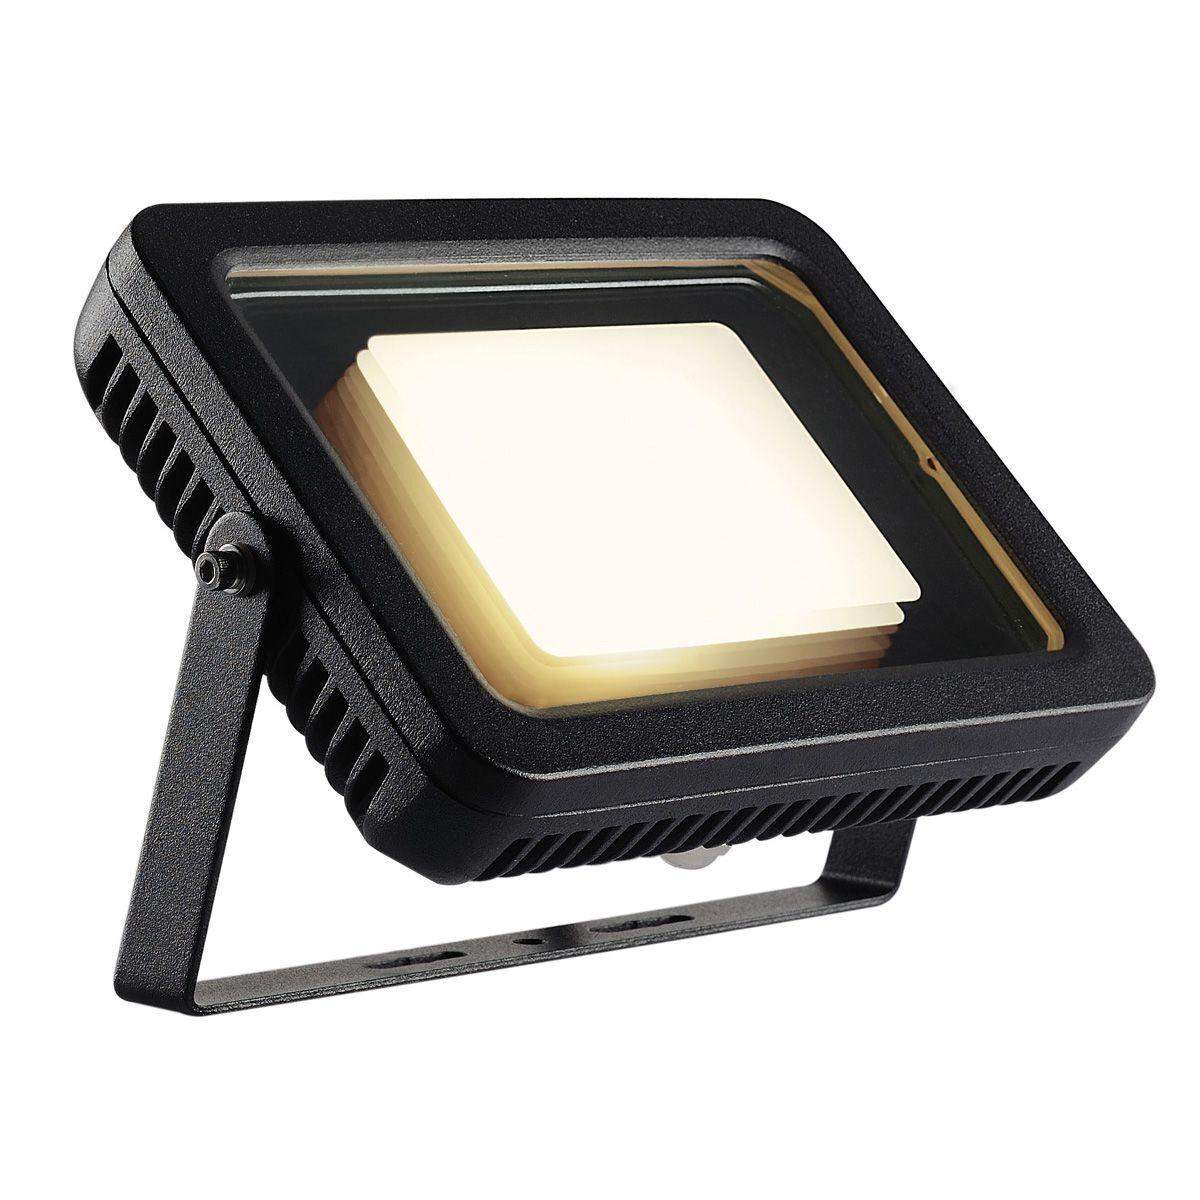 BI LED Koito Светодиодные линзы , Оригинал Japan во